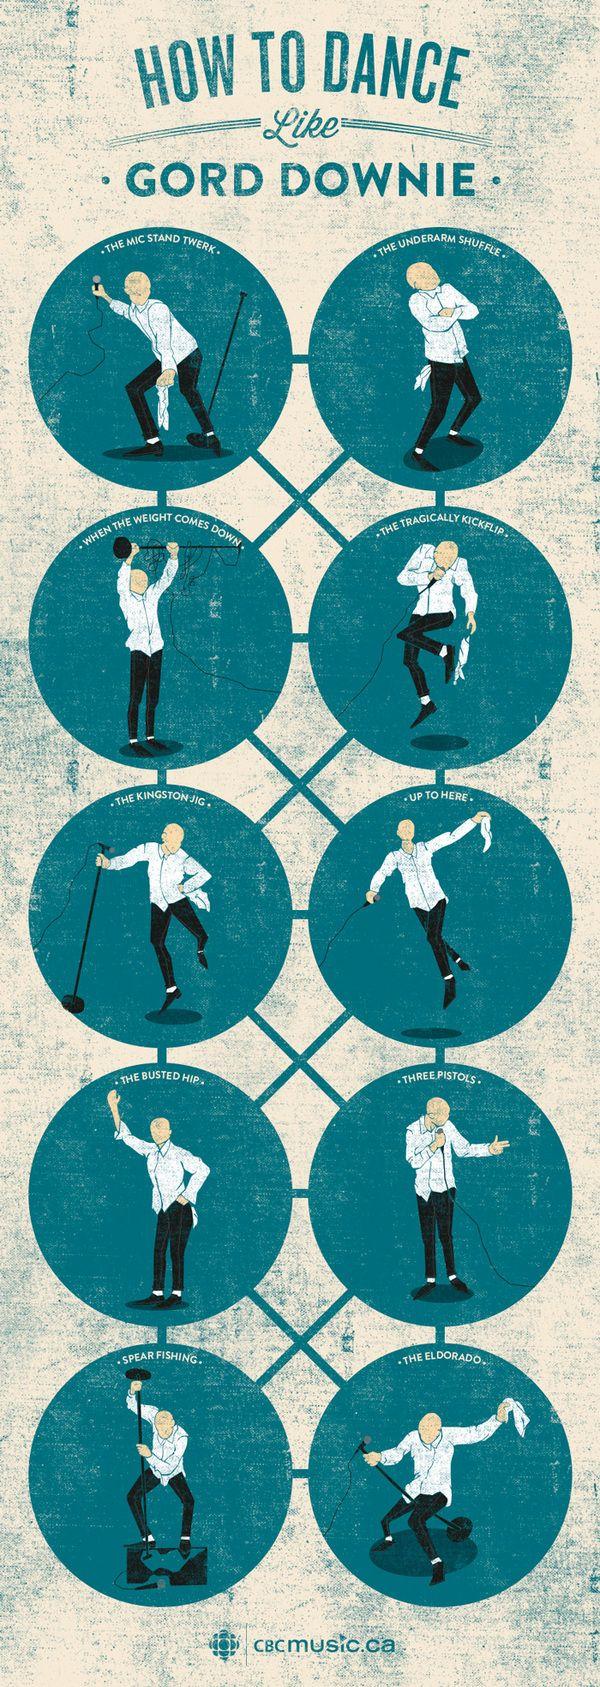 Markus Wrelands Infographics (http://www.markuswreland.com/?projects=dance-like-gord-downie#/cbc-music-gord-downie-infographics/)